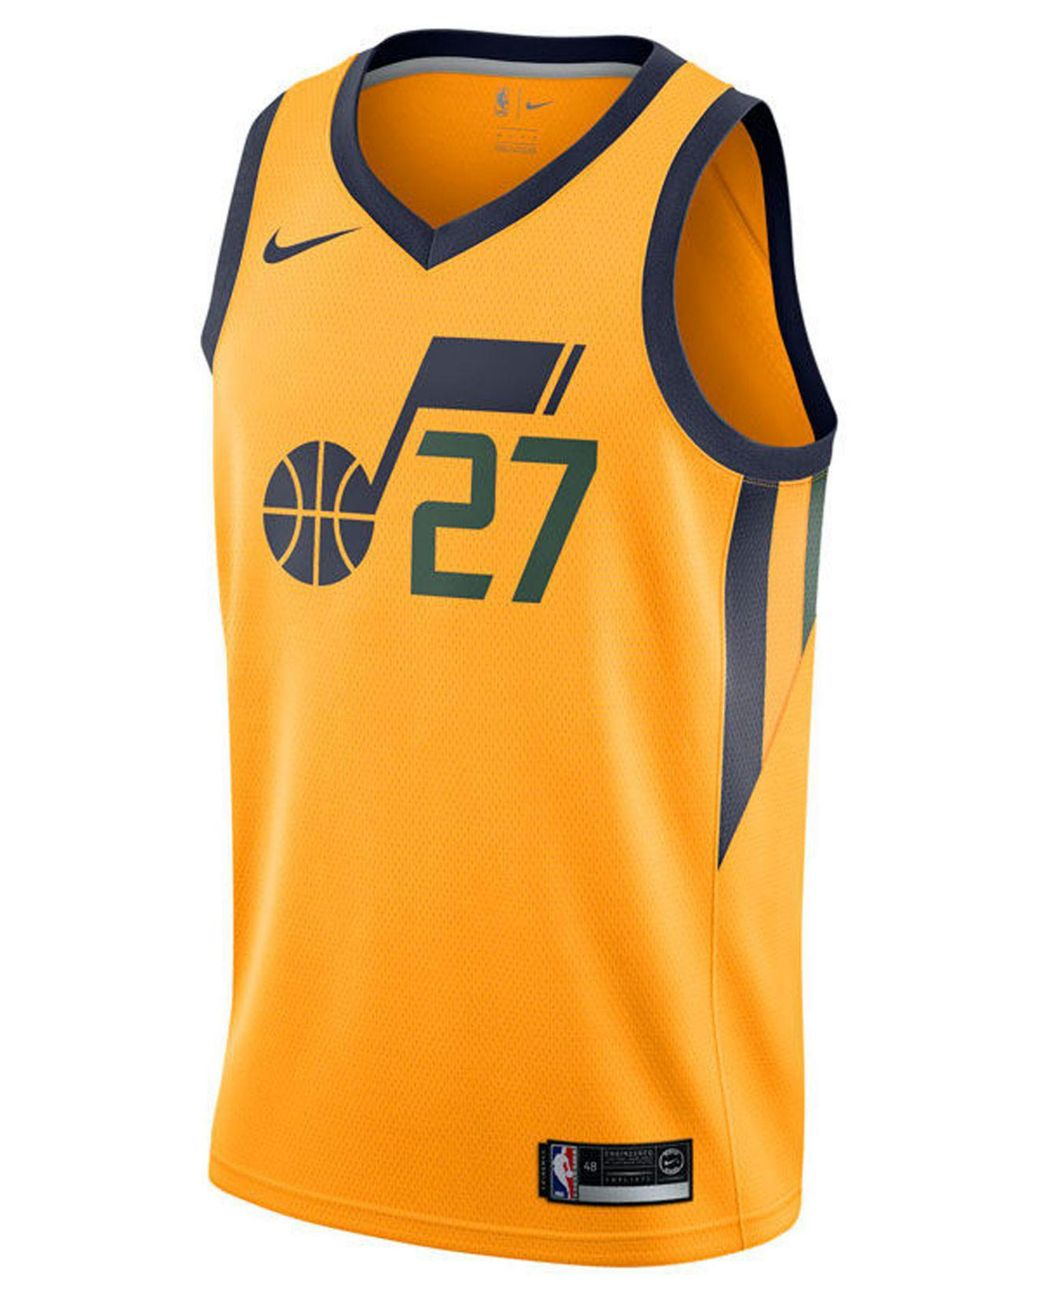 low cost 59687 d3c31 Lyst - Nike Rudy Gobert Utah Jazz City Swingman Jersey in ...